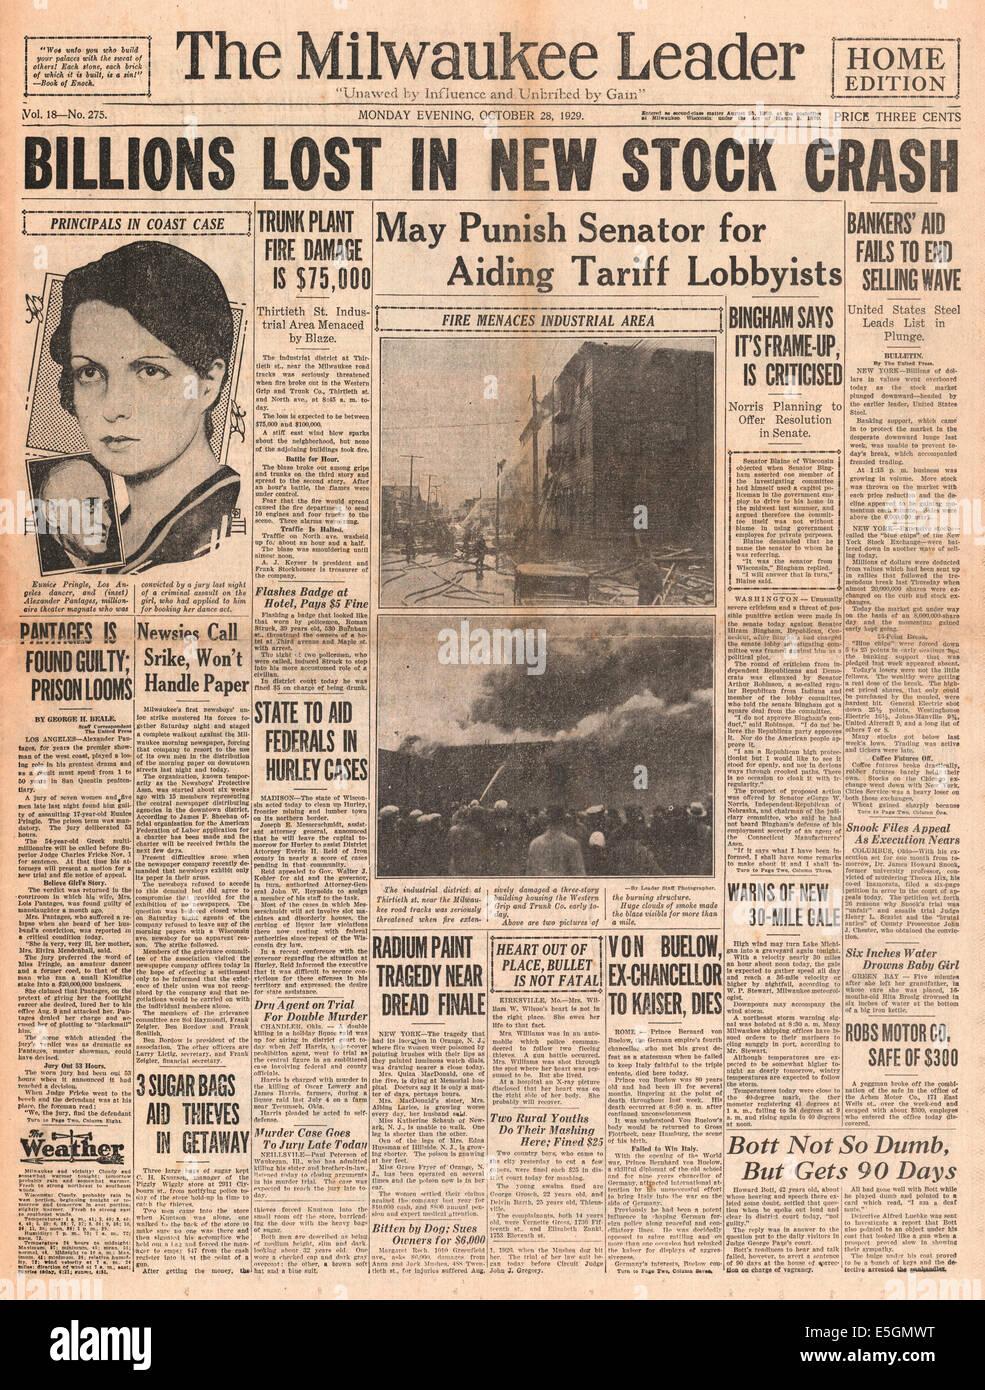 1929 Milwaukee Journal (EE.UU.) Página frontal informando de la caída de Wall Street Imagen De Stock